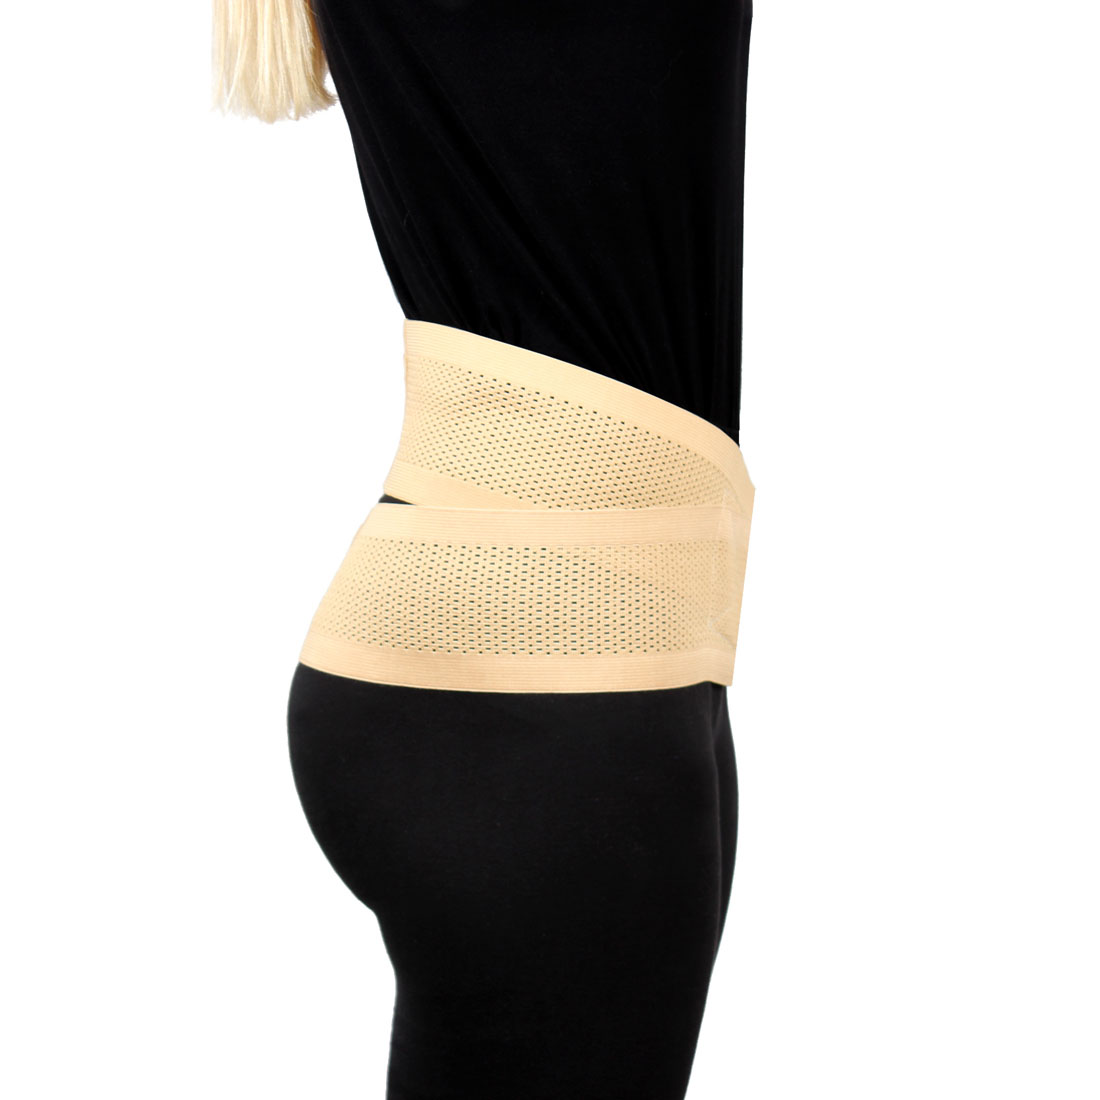 Бандаж для спины, бежевый, размер S/М [06733],